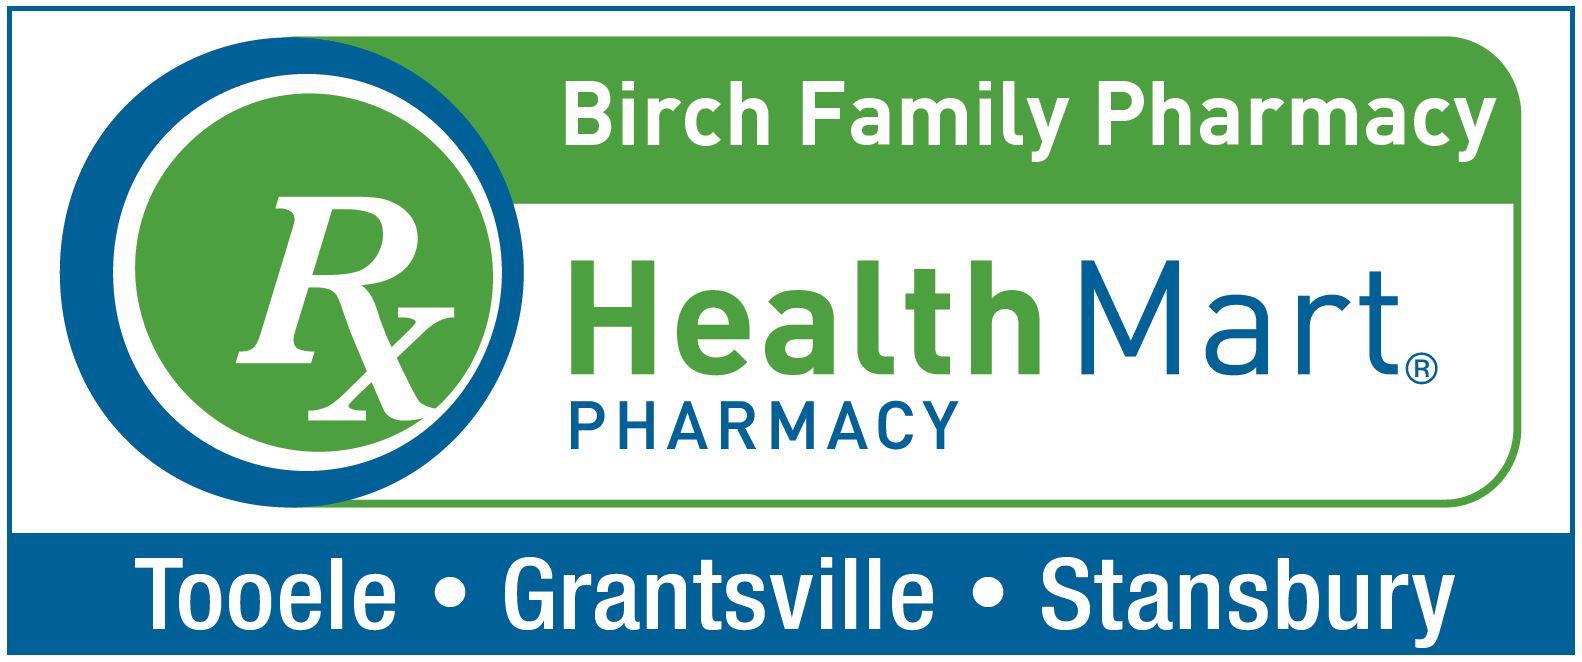 Birch Pharmacy 435-882-8880